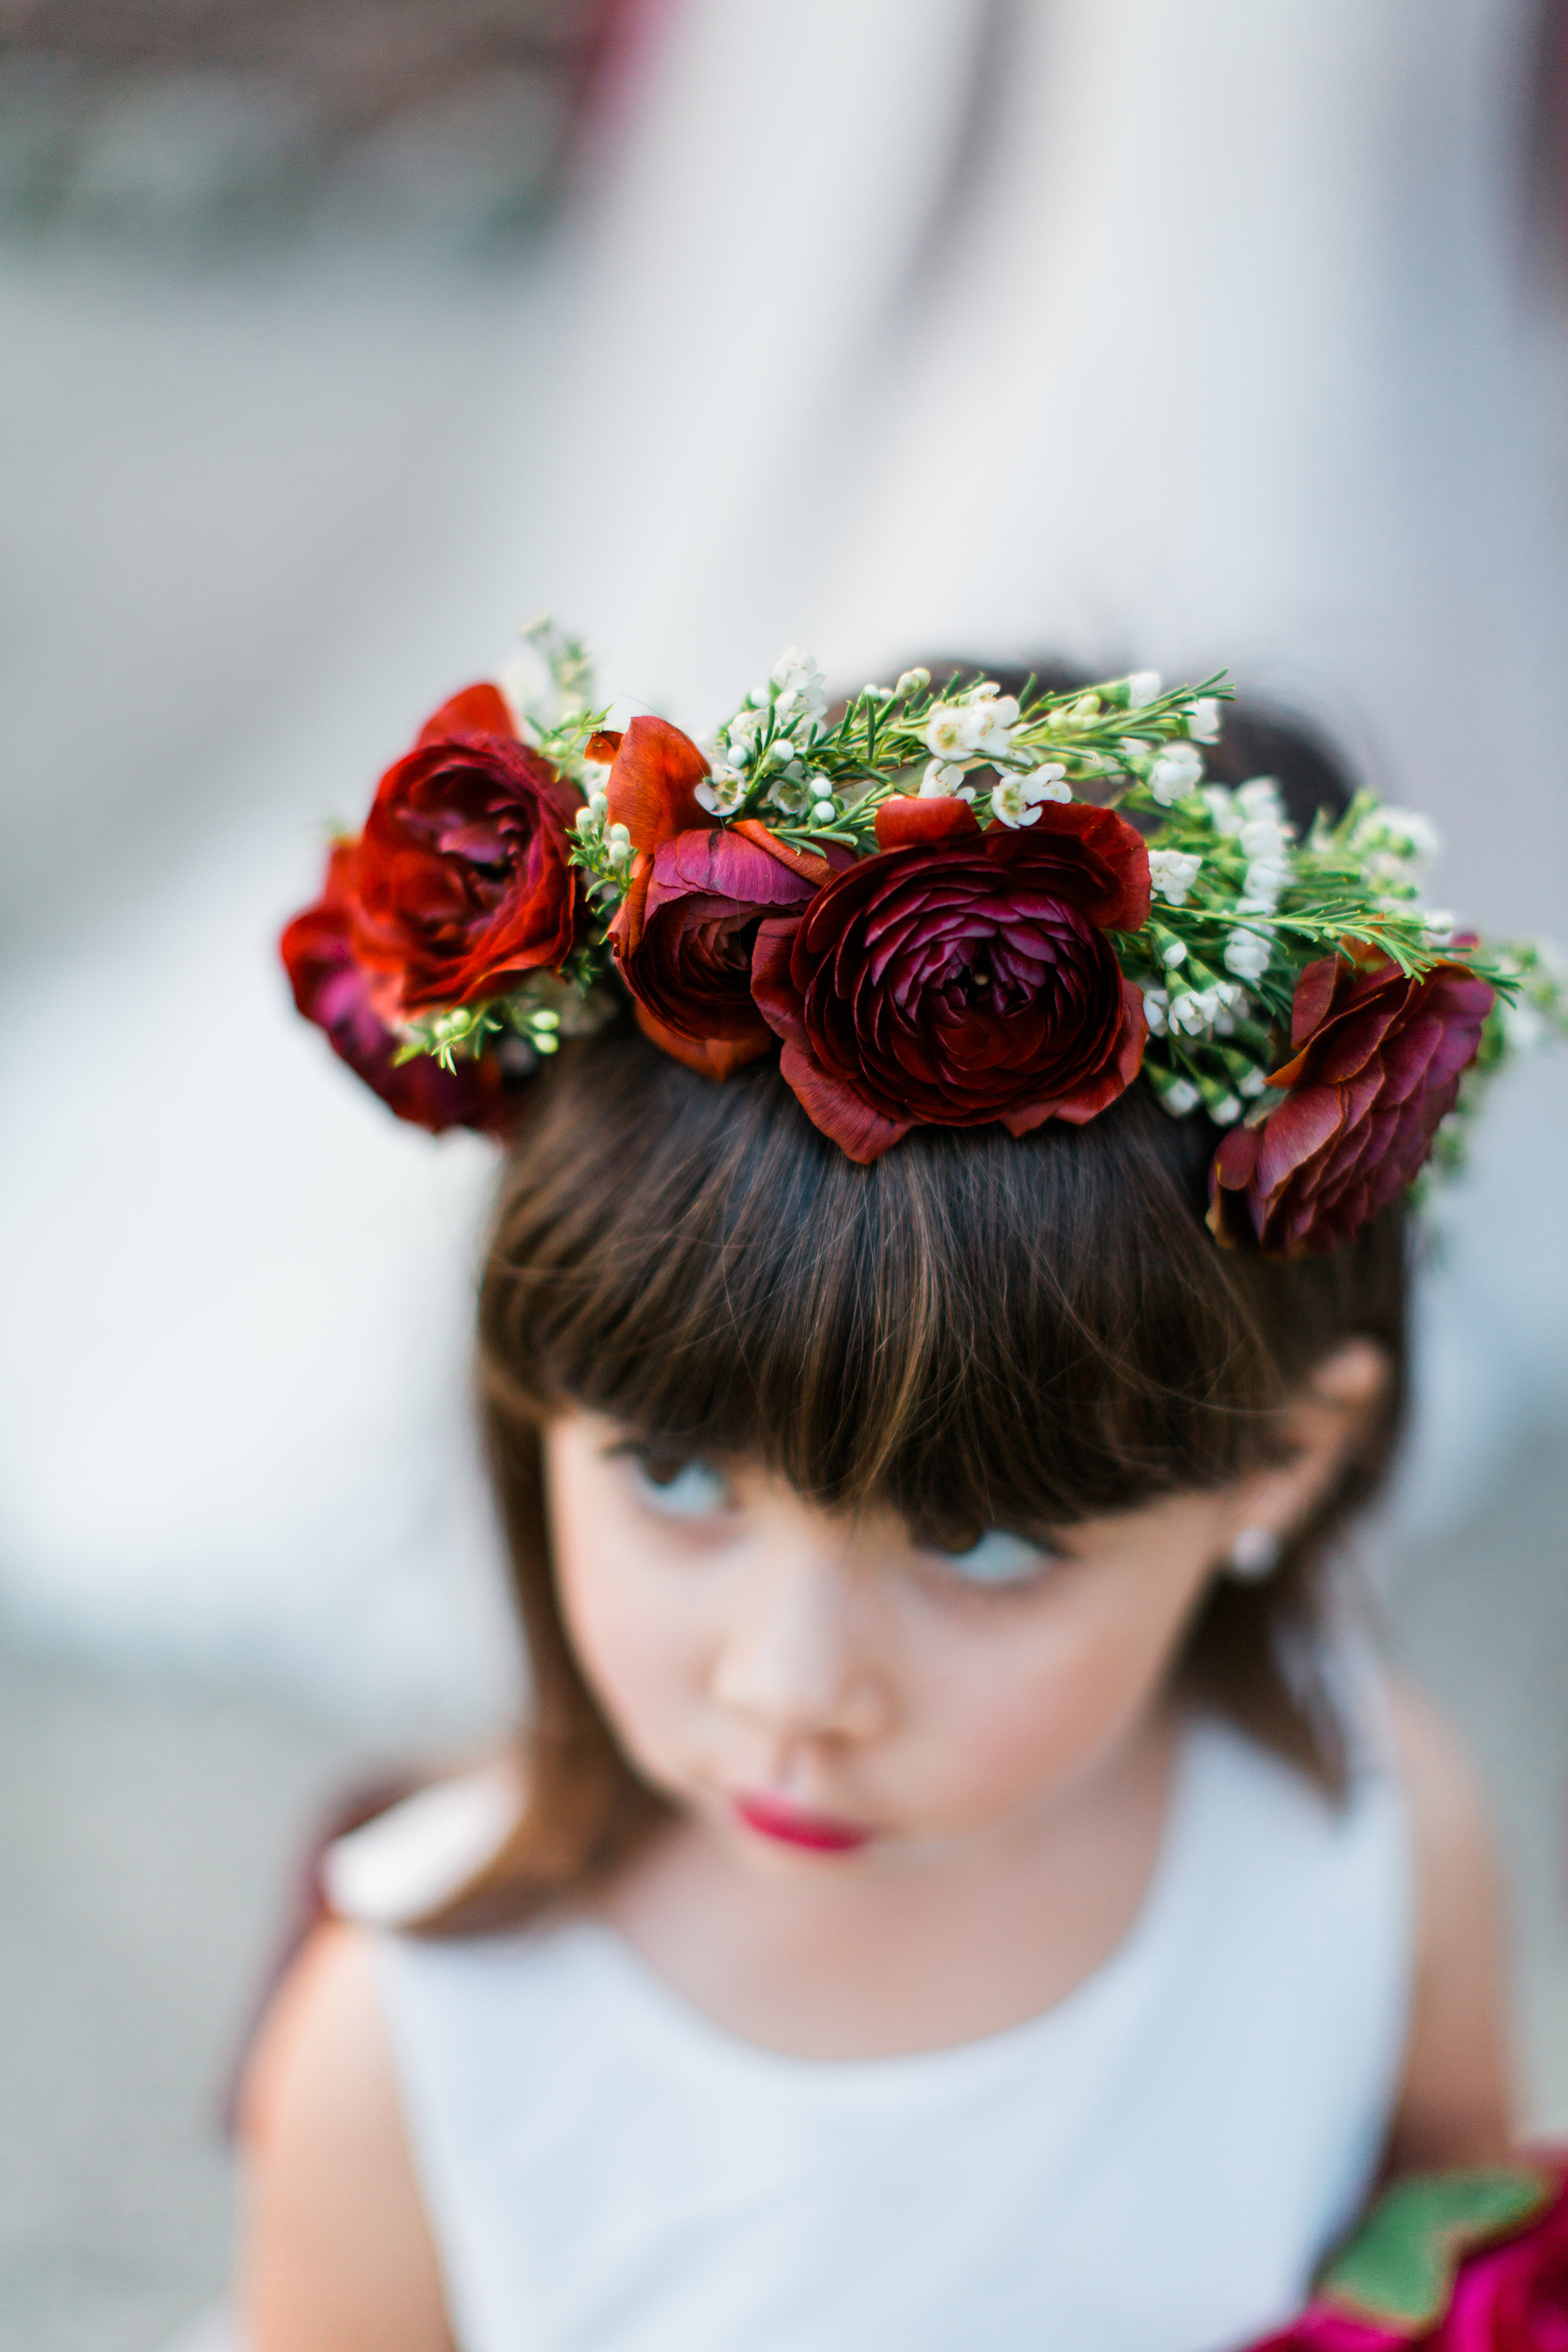 Flower Girl Bun Hairstyle Bangs and Blooms